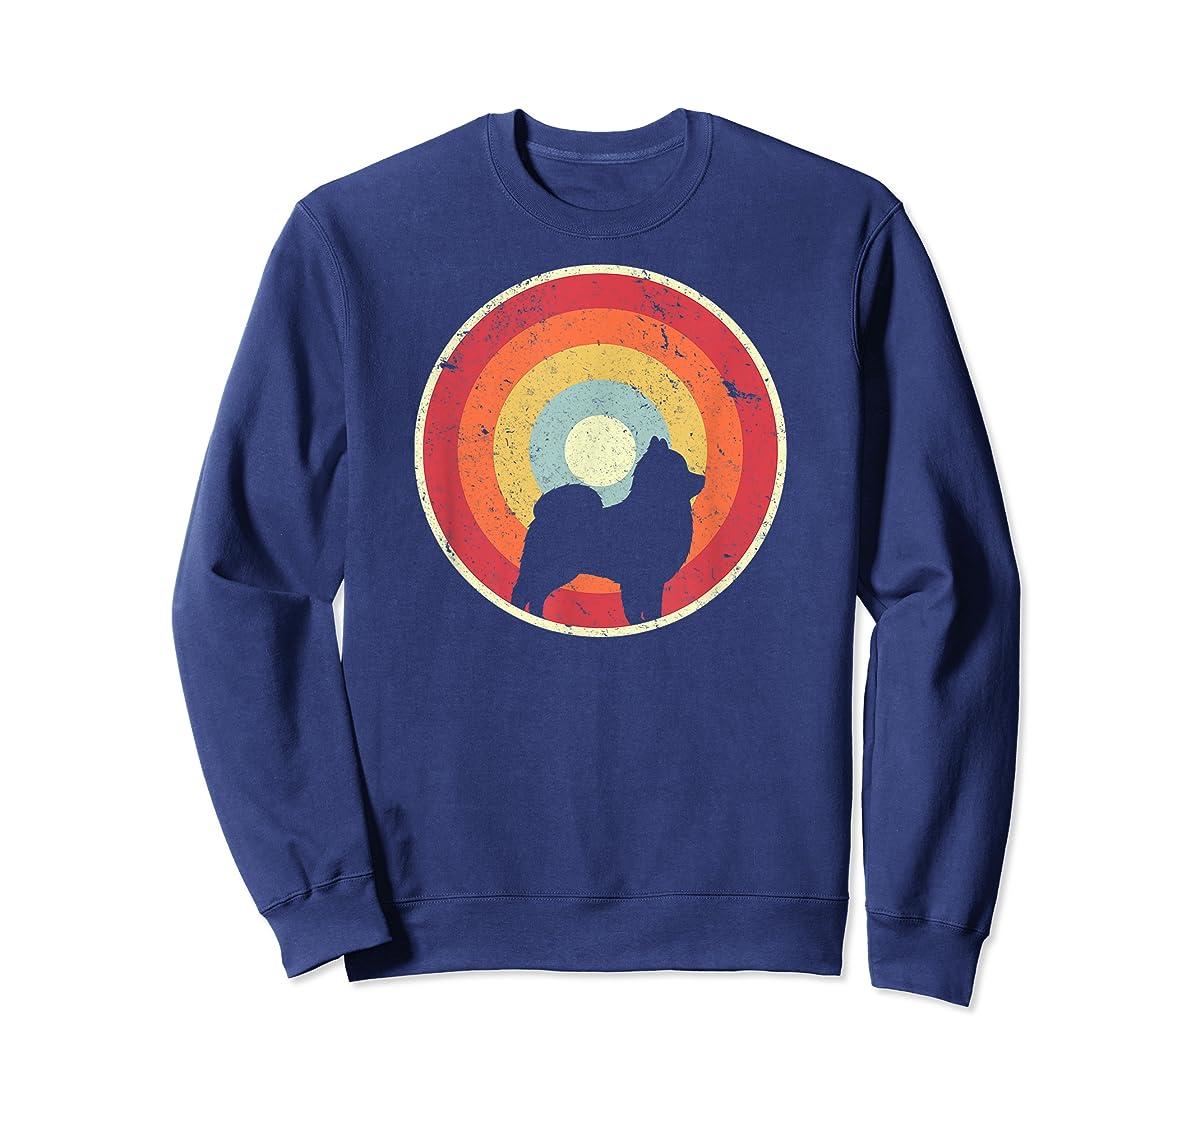 Pomeranian Shirt. Retro Style T-Shirt-Sweatshirt-Navy